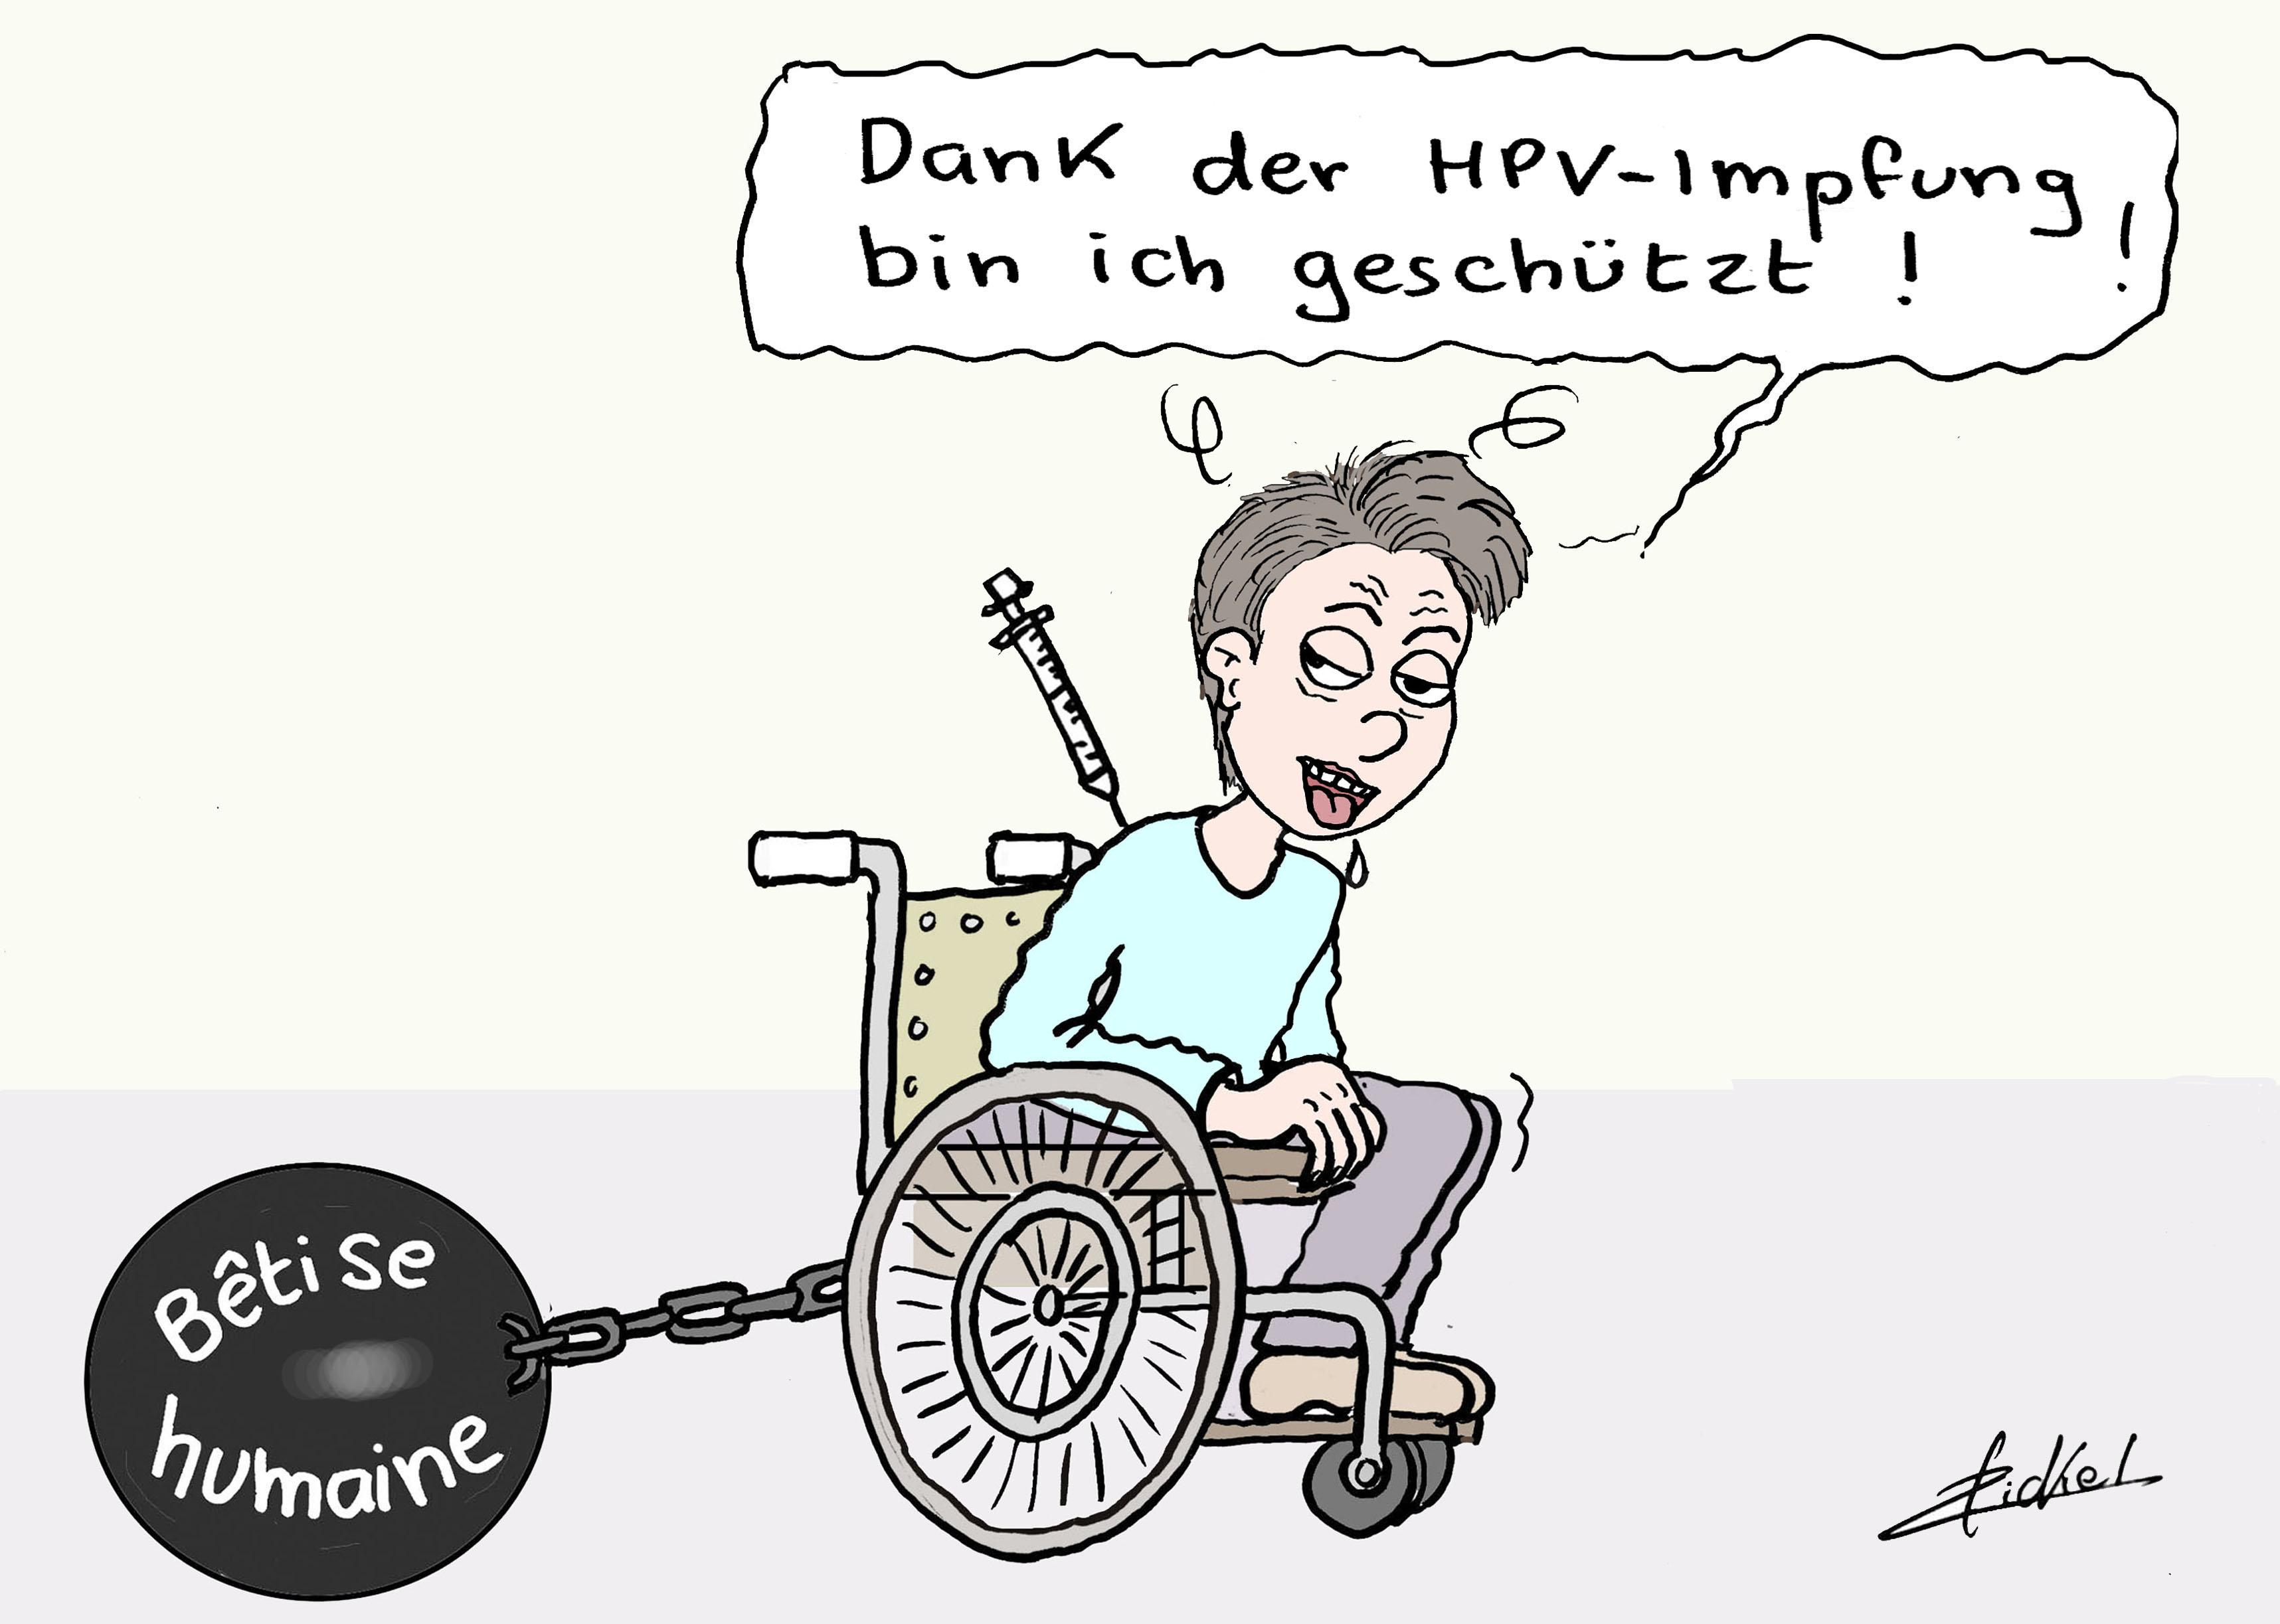 hpv impfung luxemburg)